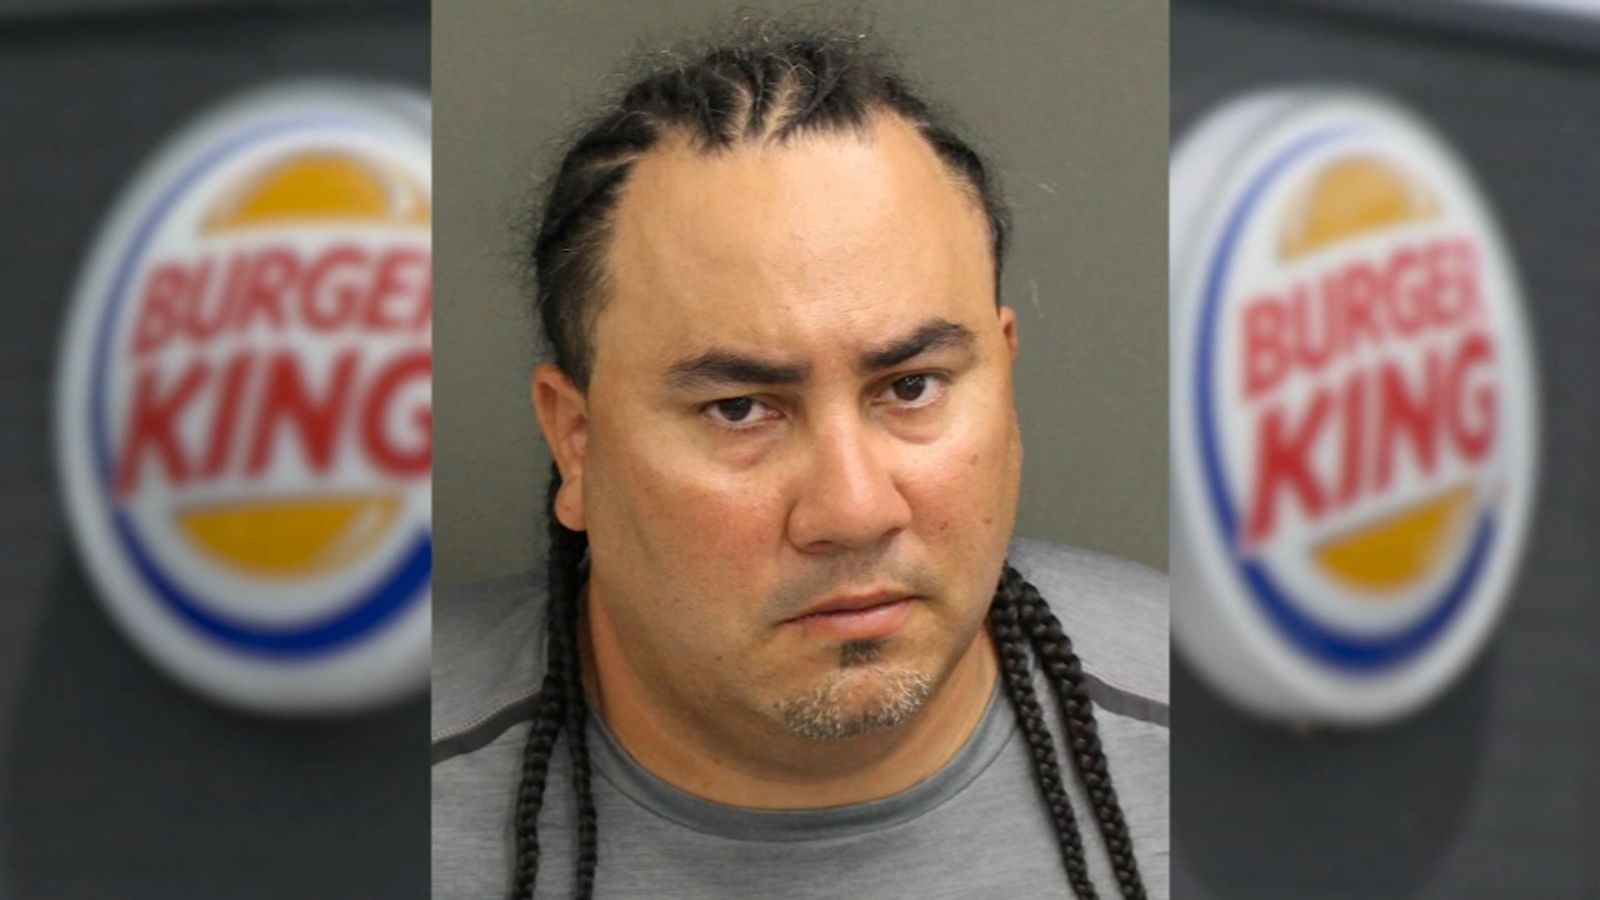 Burger King worker shot and killed over food wait time